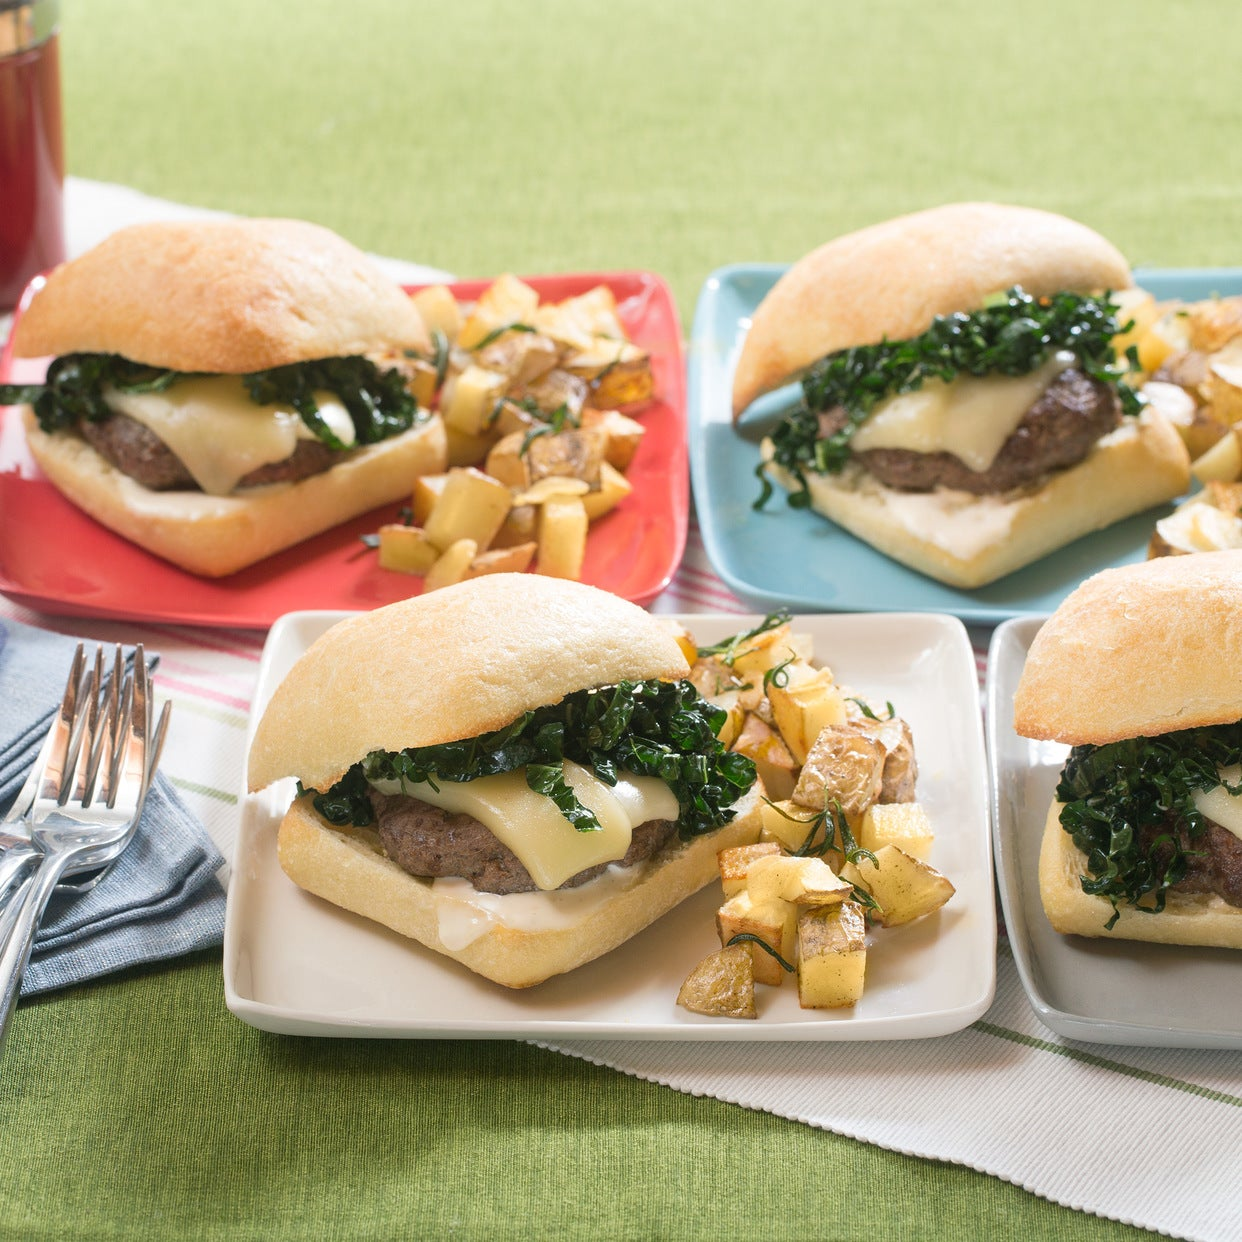 Fontina Cheeseburgers on Ciabatta with Garlic-Rosemary Potatoes